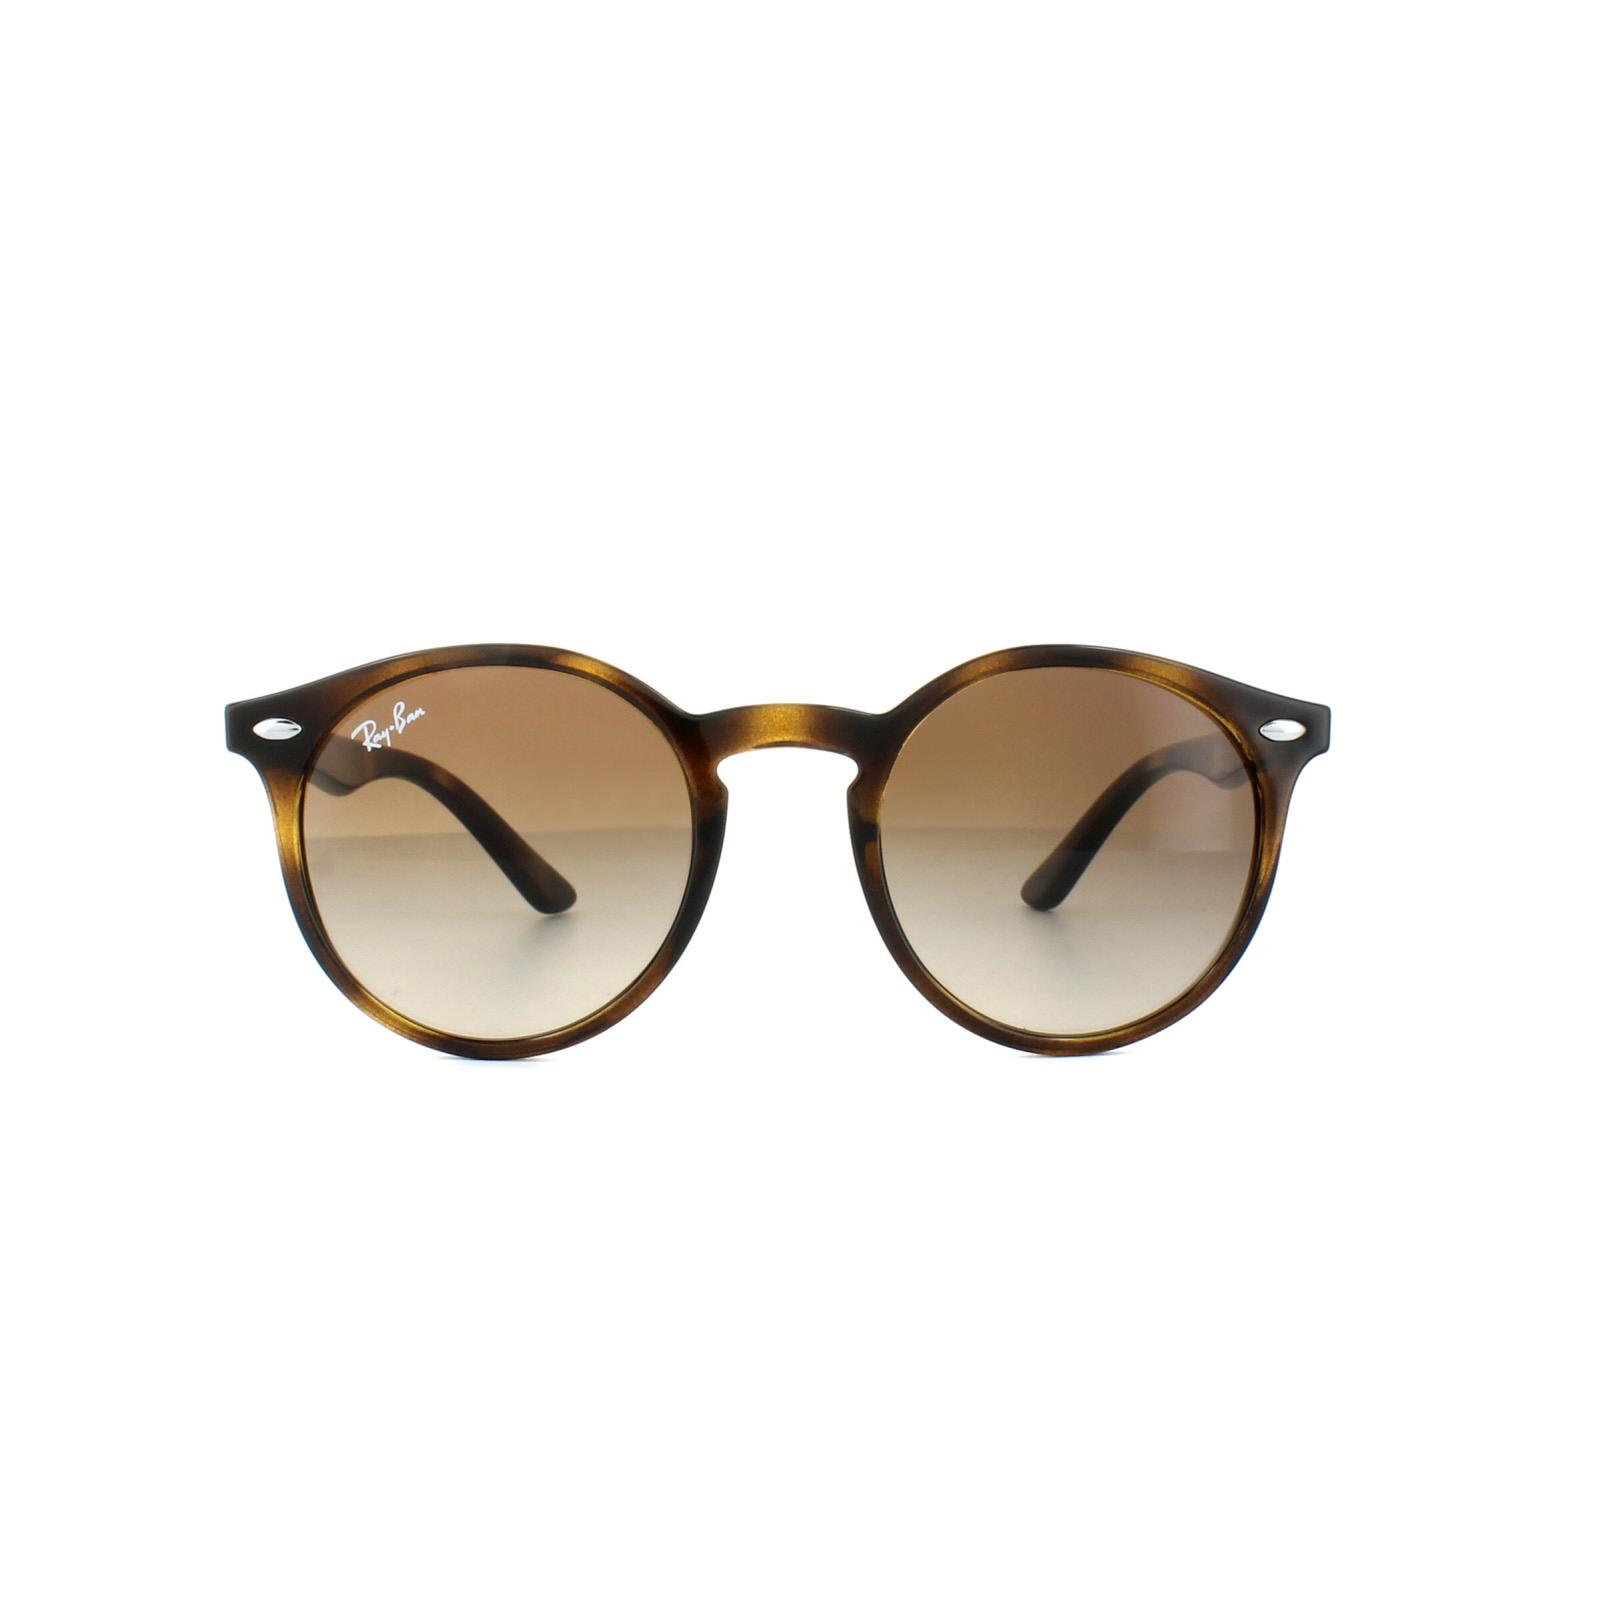 ee22f7ecc8d Sentinel Ray-Ban Junior Sunglasses 9064 152 13 Tortoise Brown Gradient